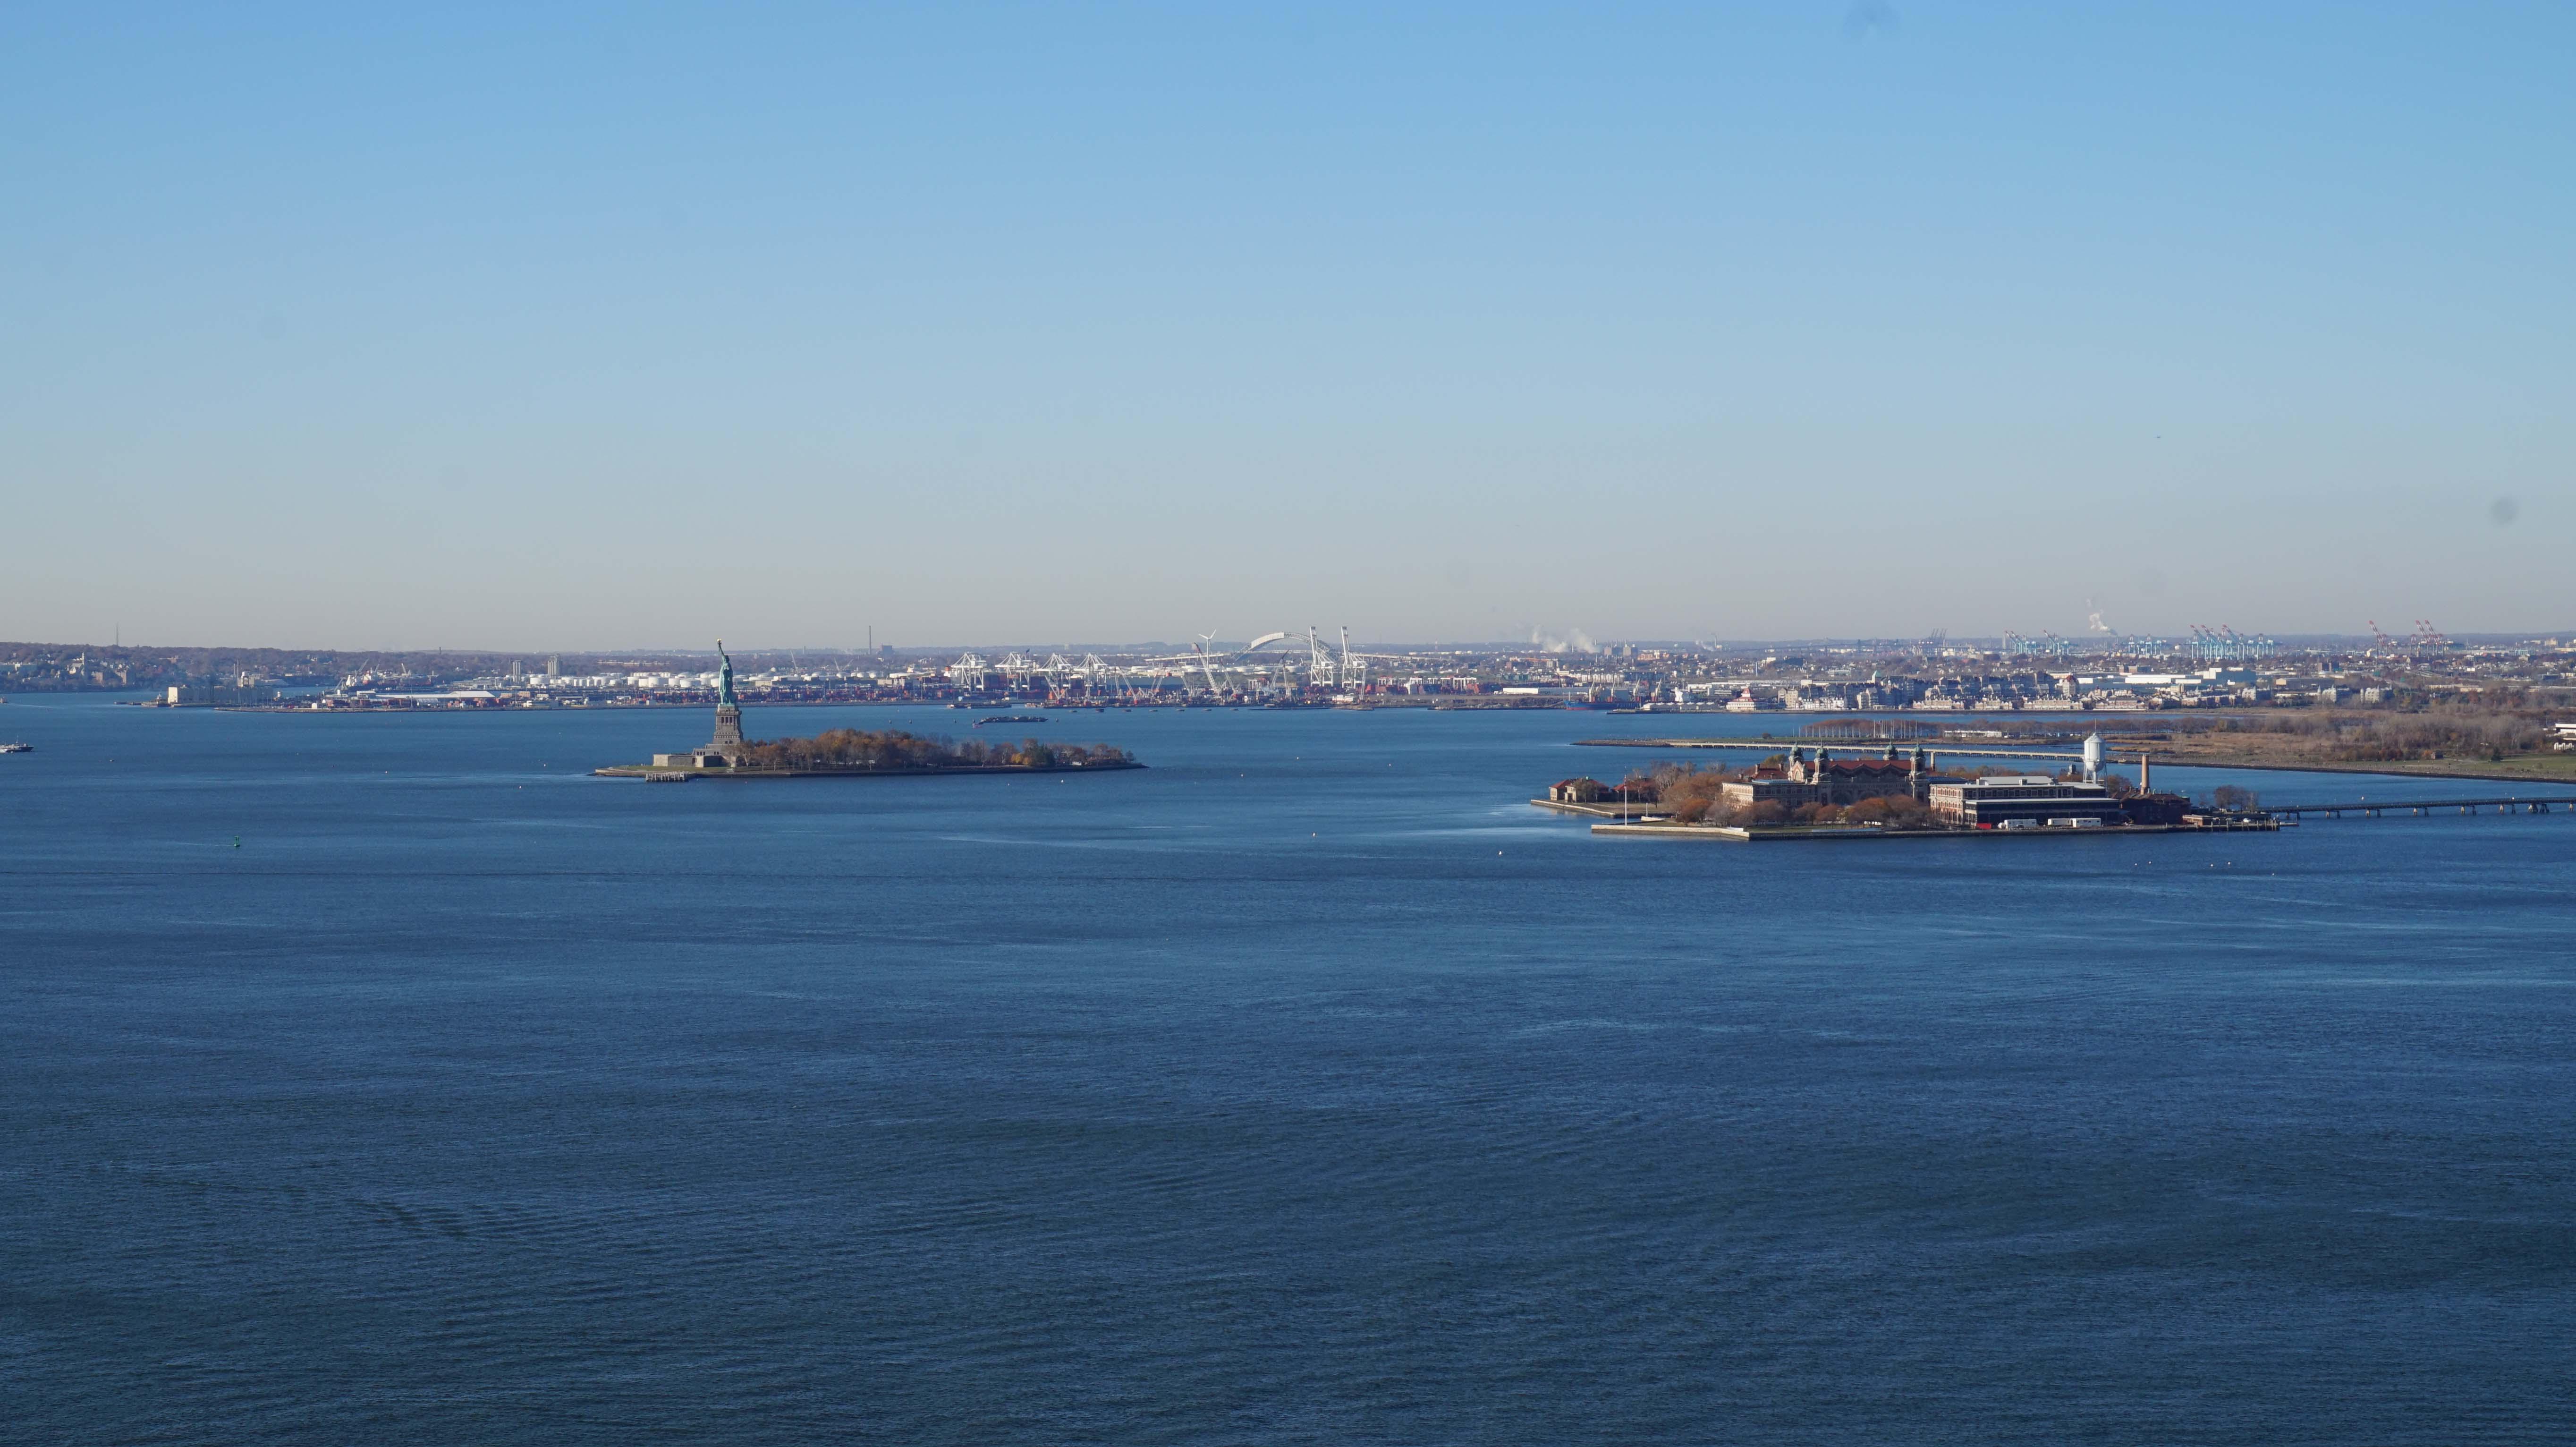 NY Harbor clear day 11-15-2014 low